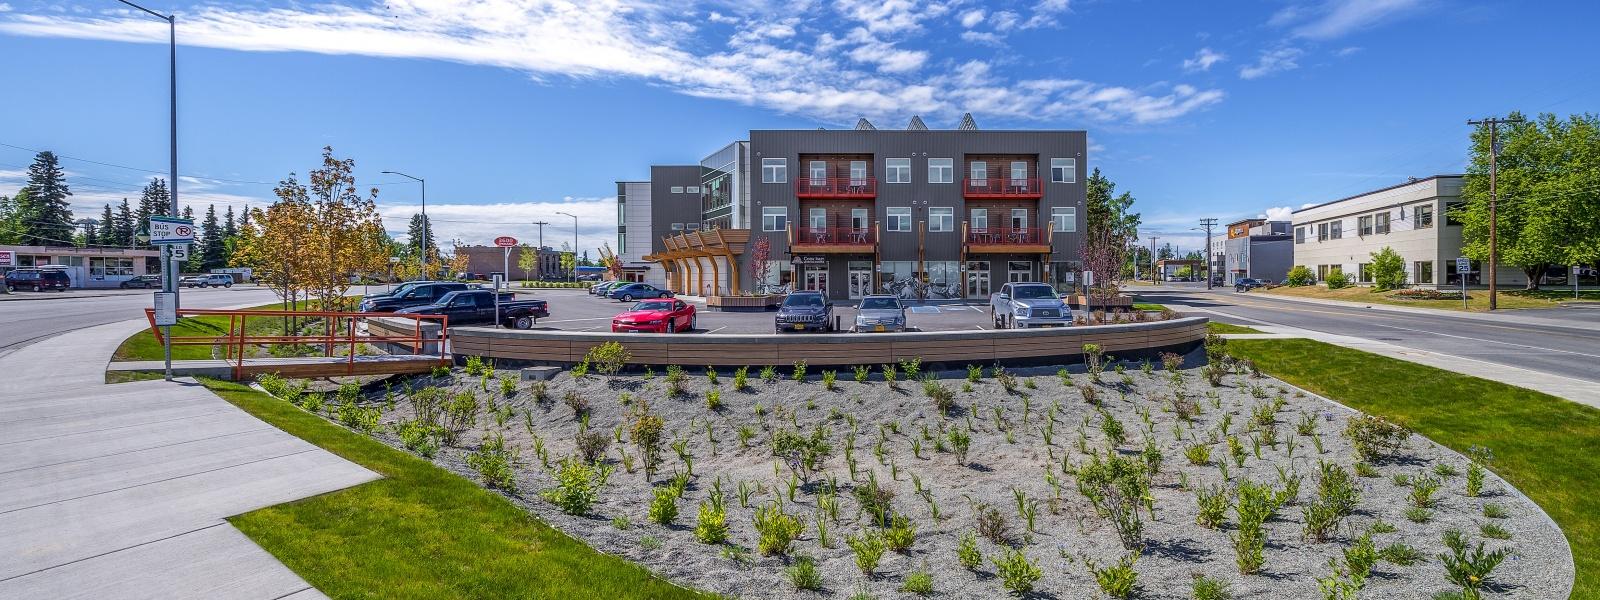 3600 Spenard, Anchorage, 99503, ,Commercial Space,For Rent,Spenard,1,1075